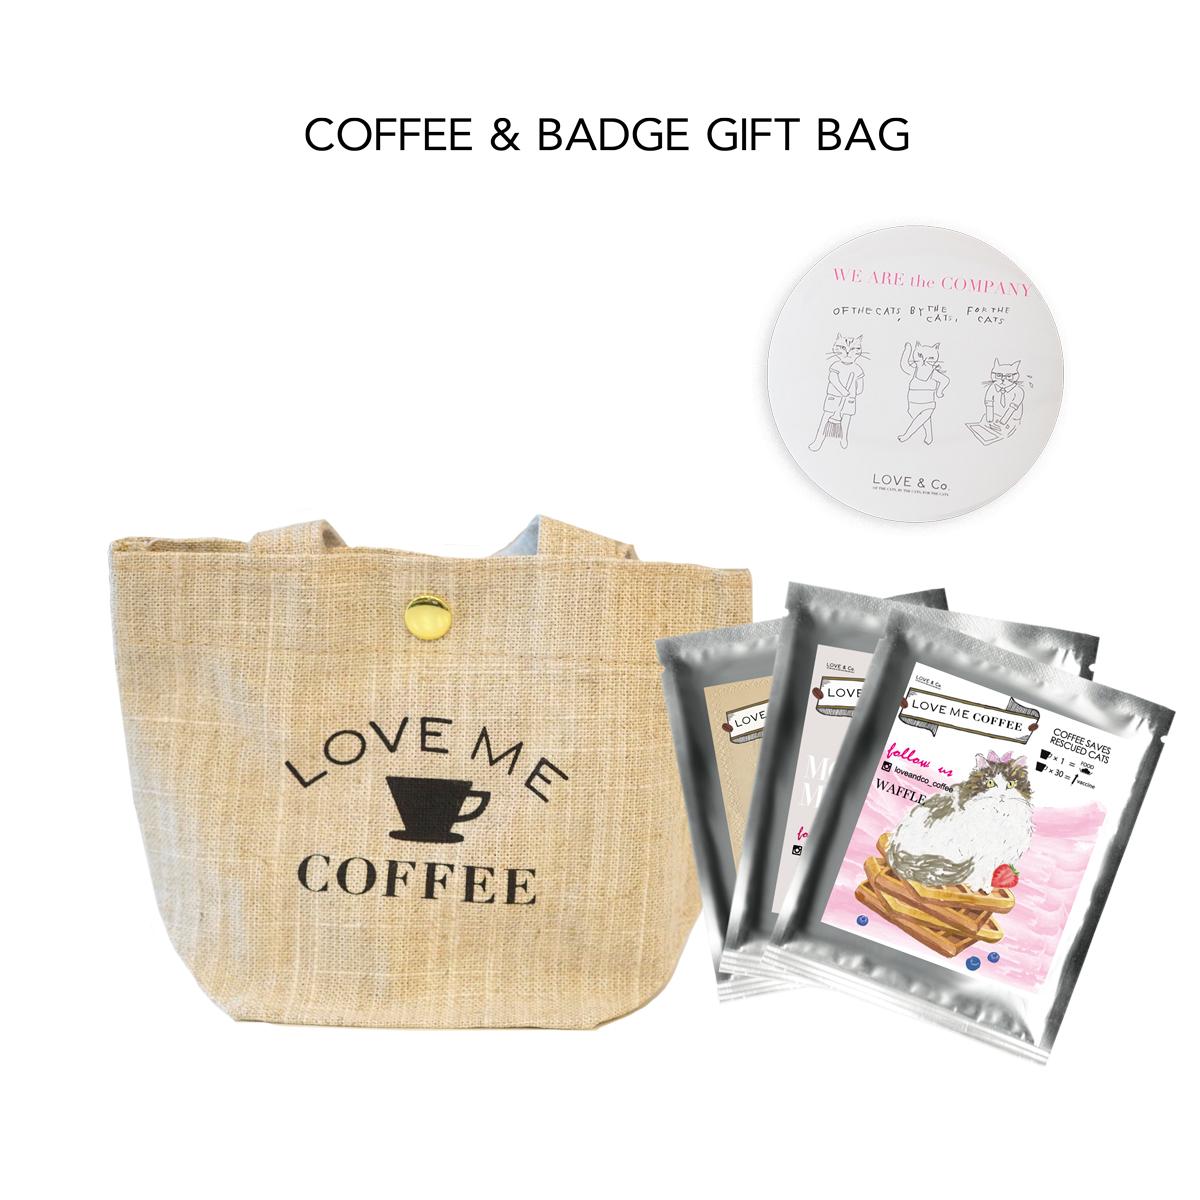 LOVE ME COFFEE & BADGE GIFT BAG 画像